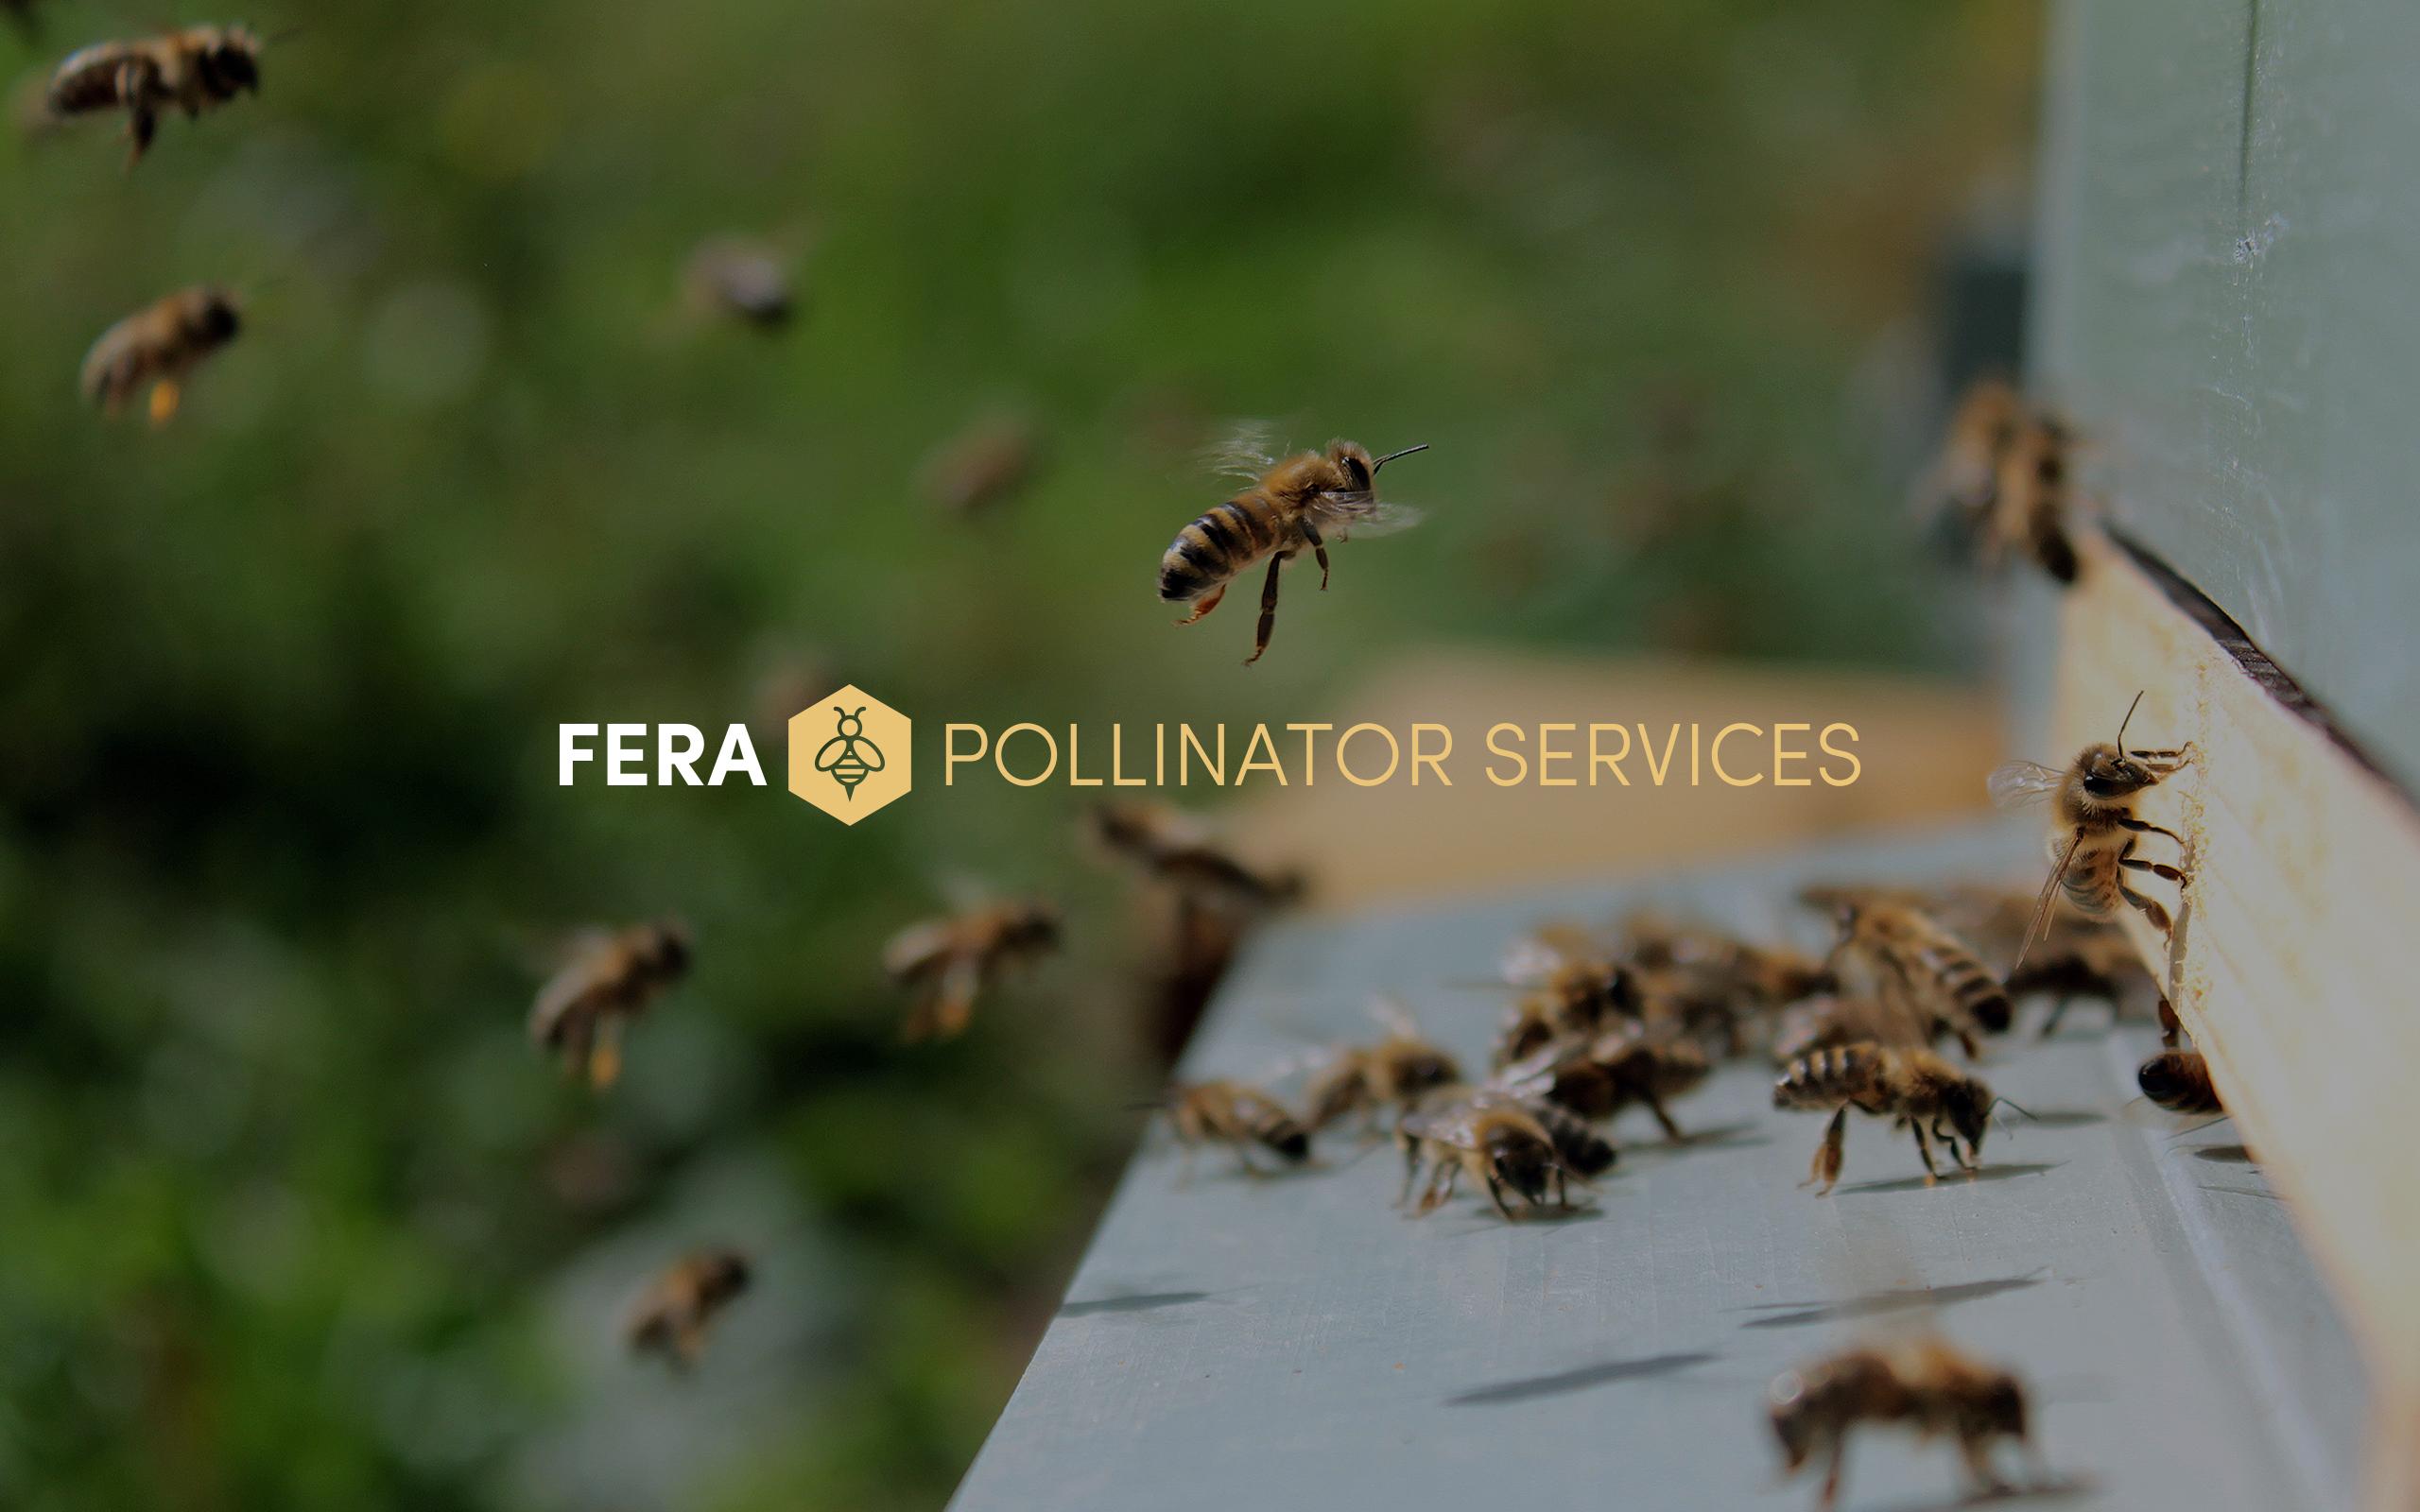 Fera pollinator logo